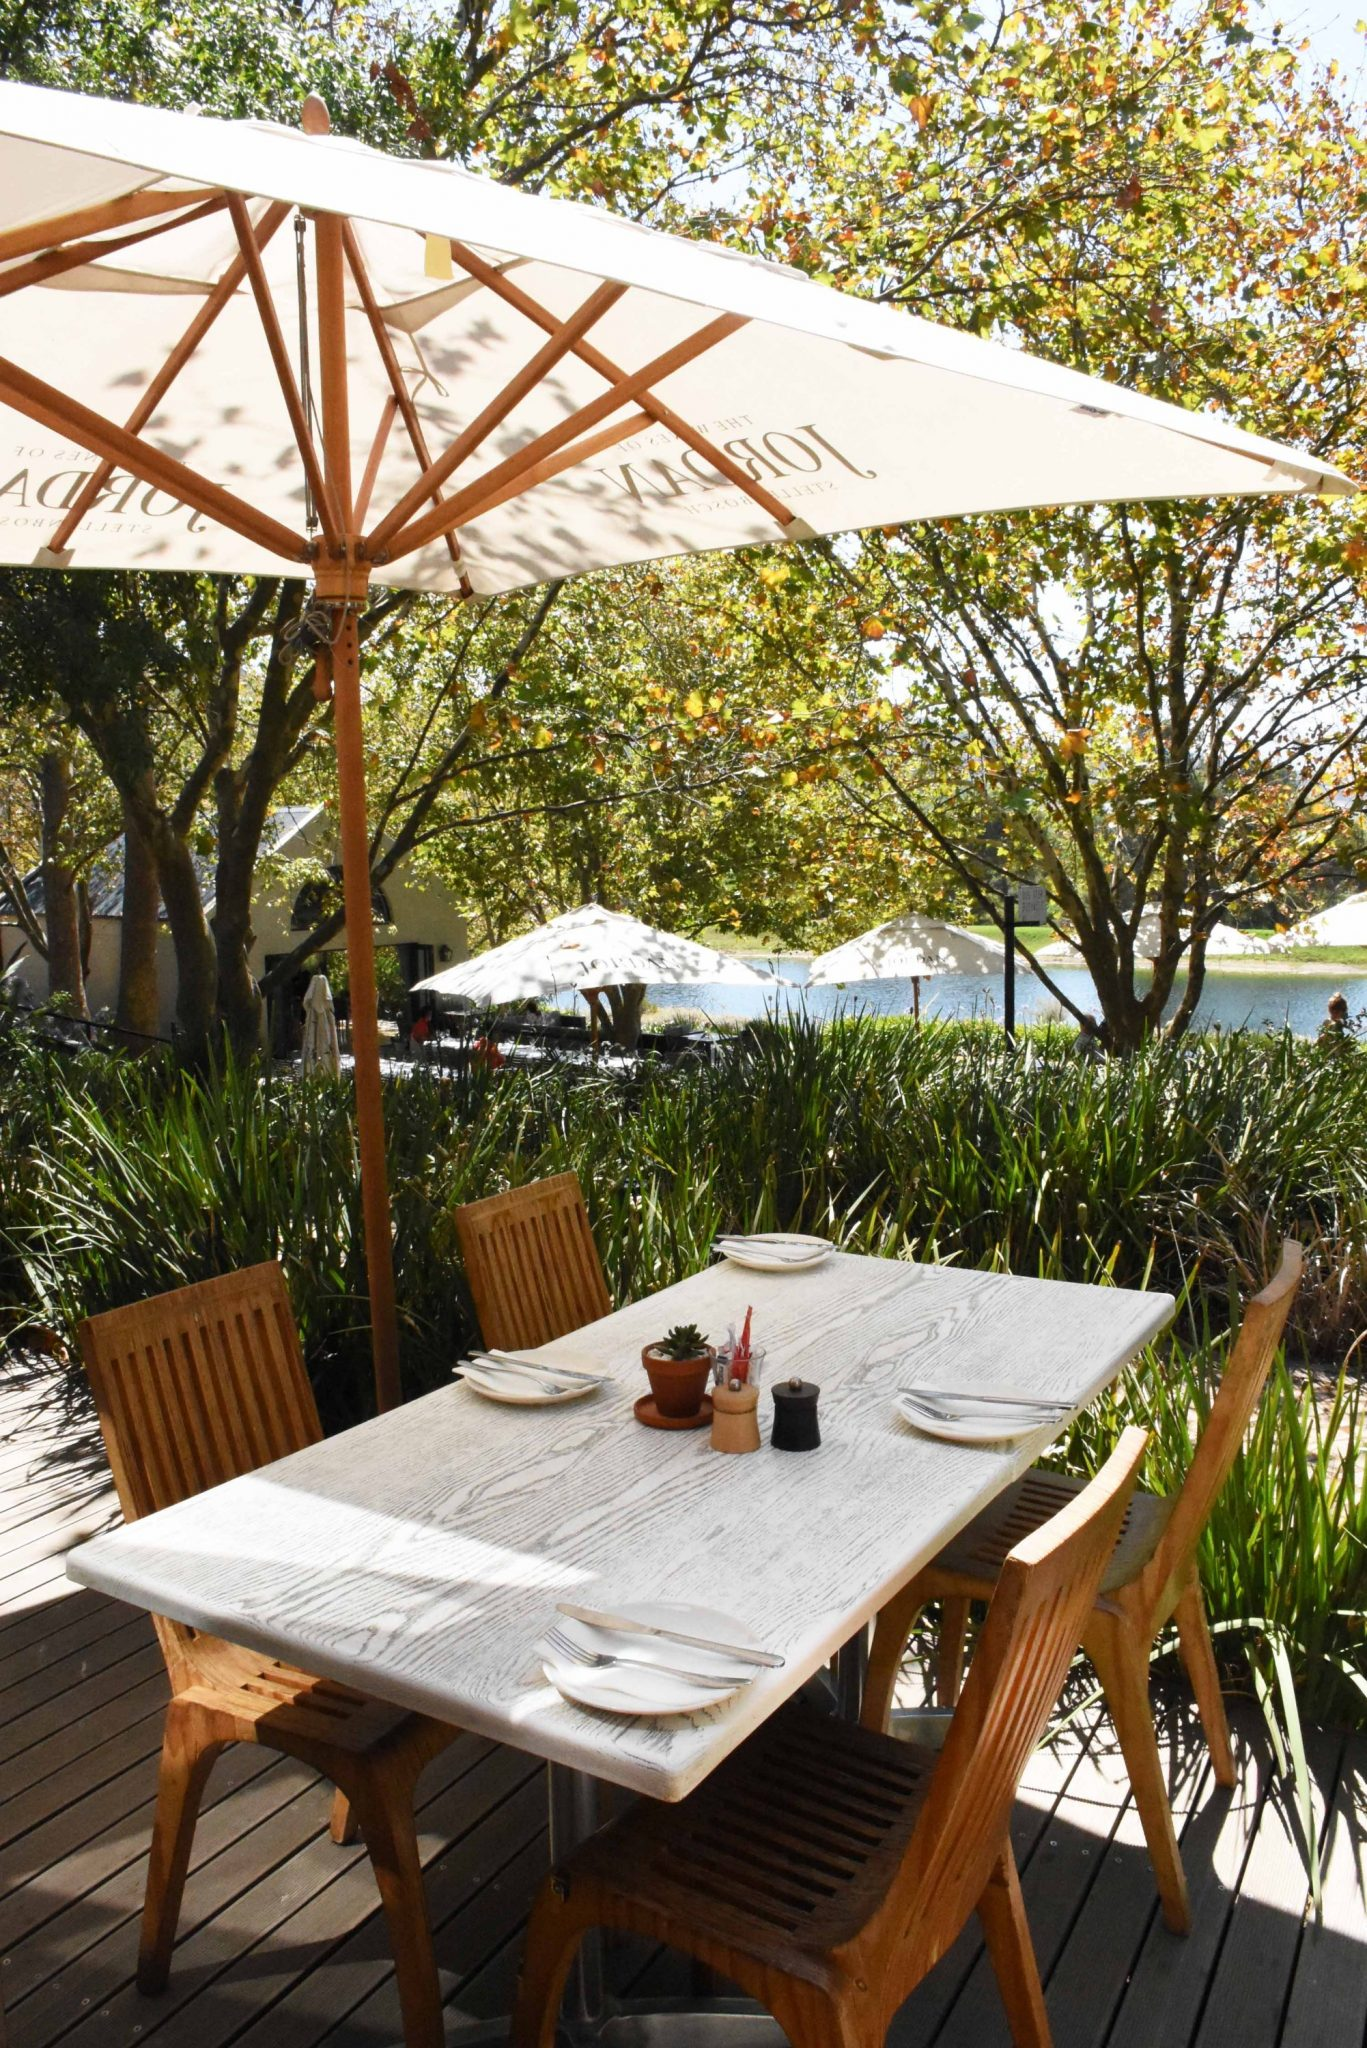 Deck tables alfresco at The Bakery, Jordan Estate, Valentines Day, Sonia Cabano blog eatdrinkcapetown